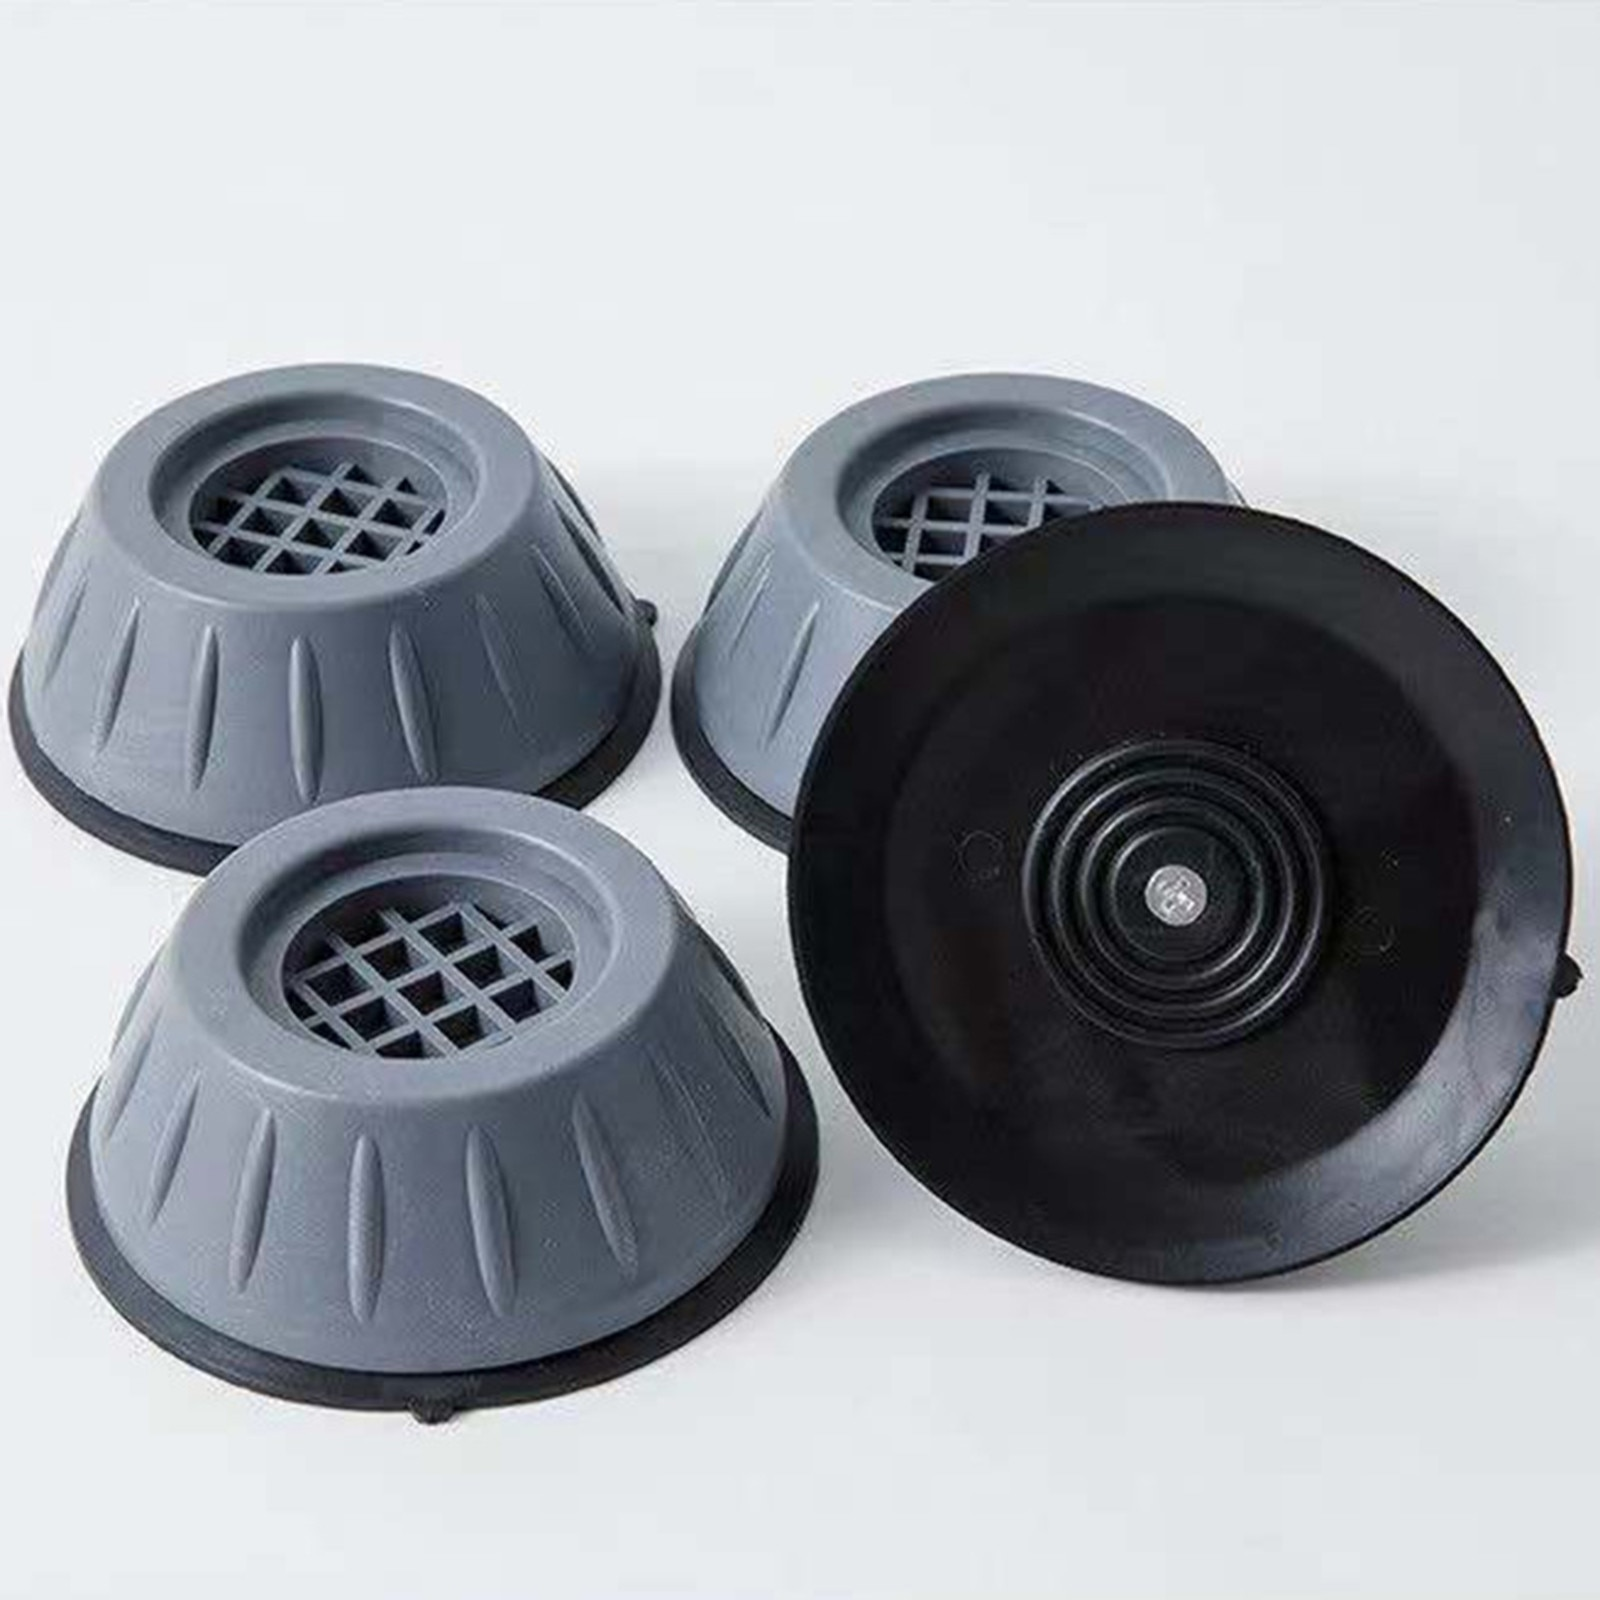 Anti Vibration Rubber Feet Pads